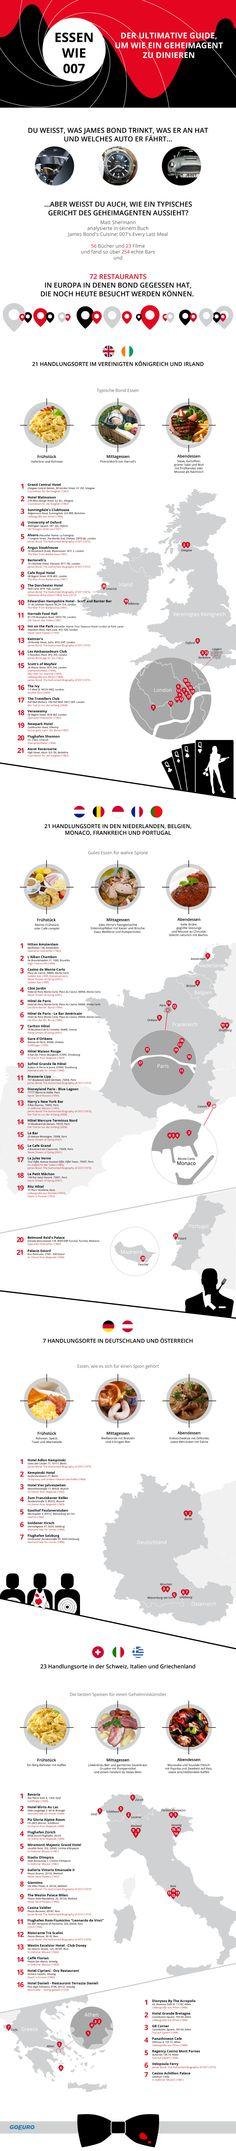 Essen wie James Bond: An diesen 72 Locations hat 007 bereits gespeist.  http://blog.goeuro.de/essen-wie-james-bond/